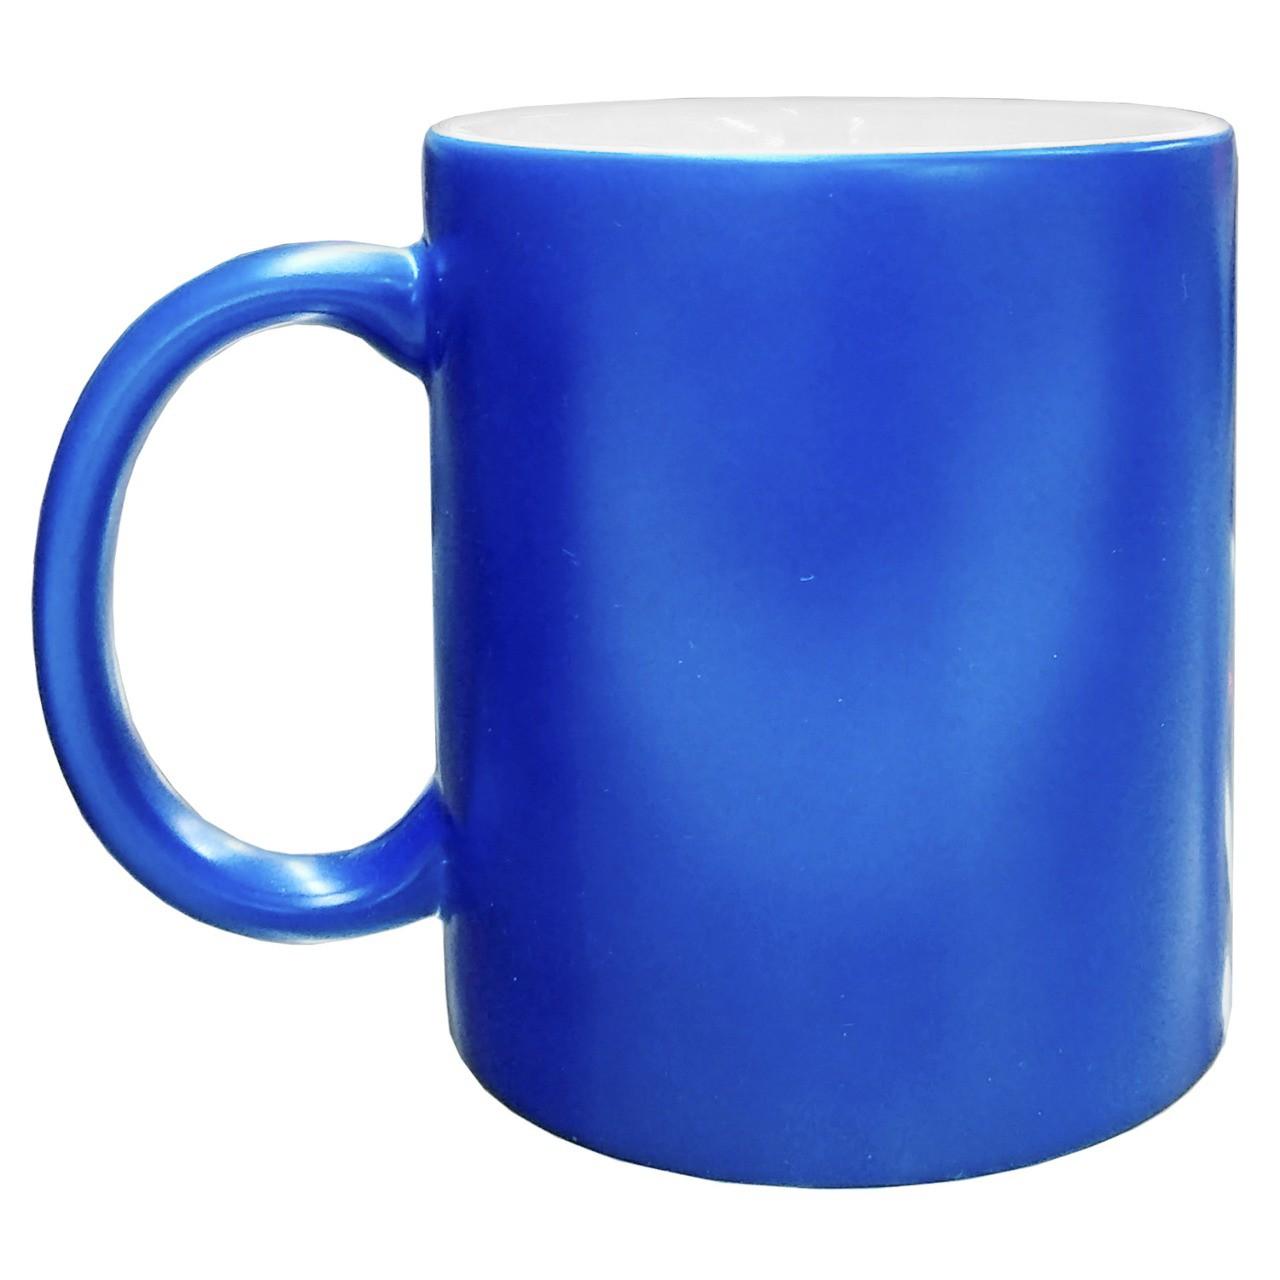 Caneca neon - Azul